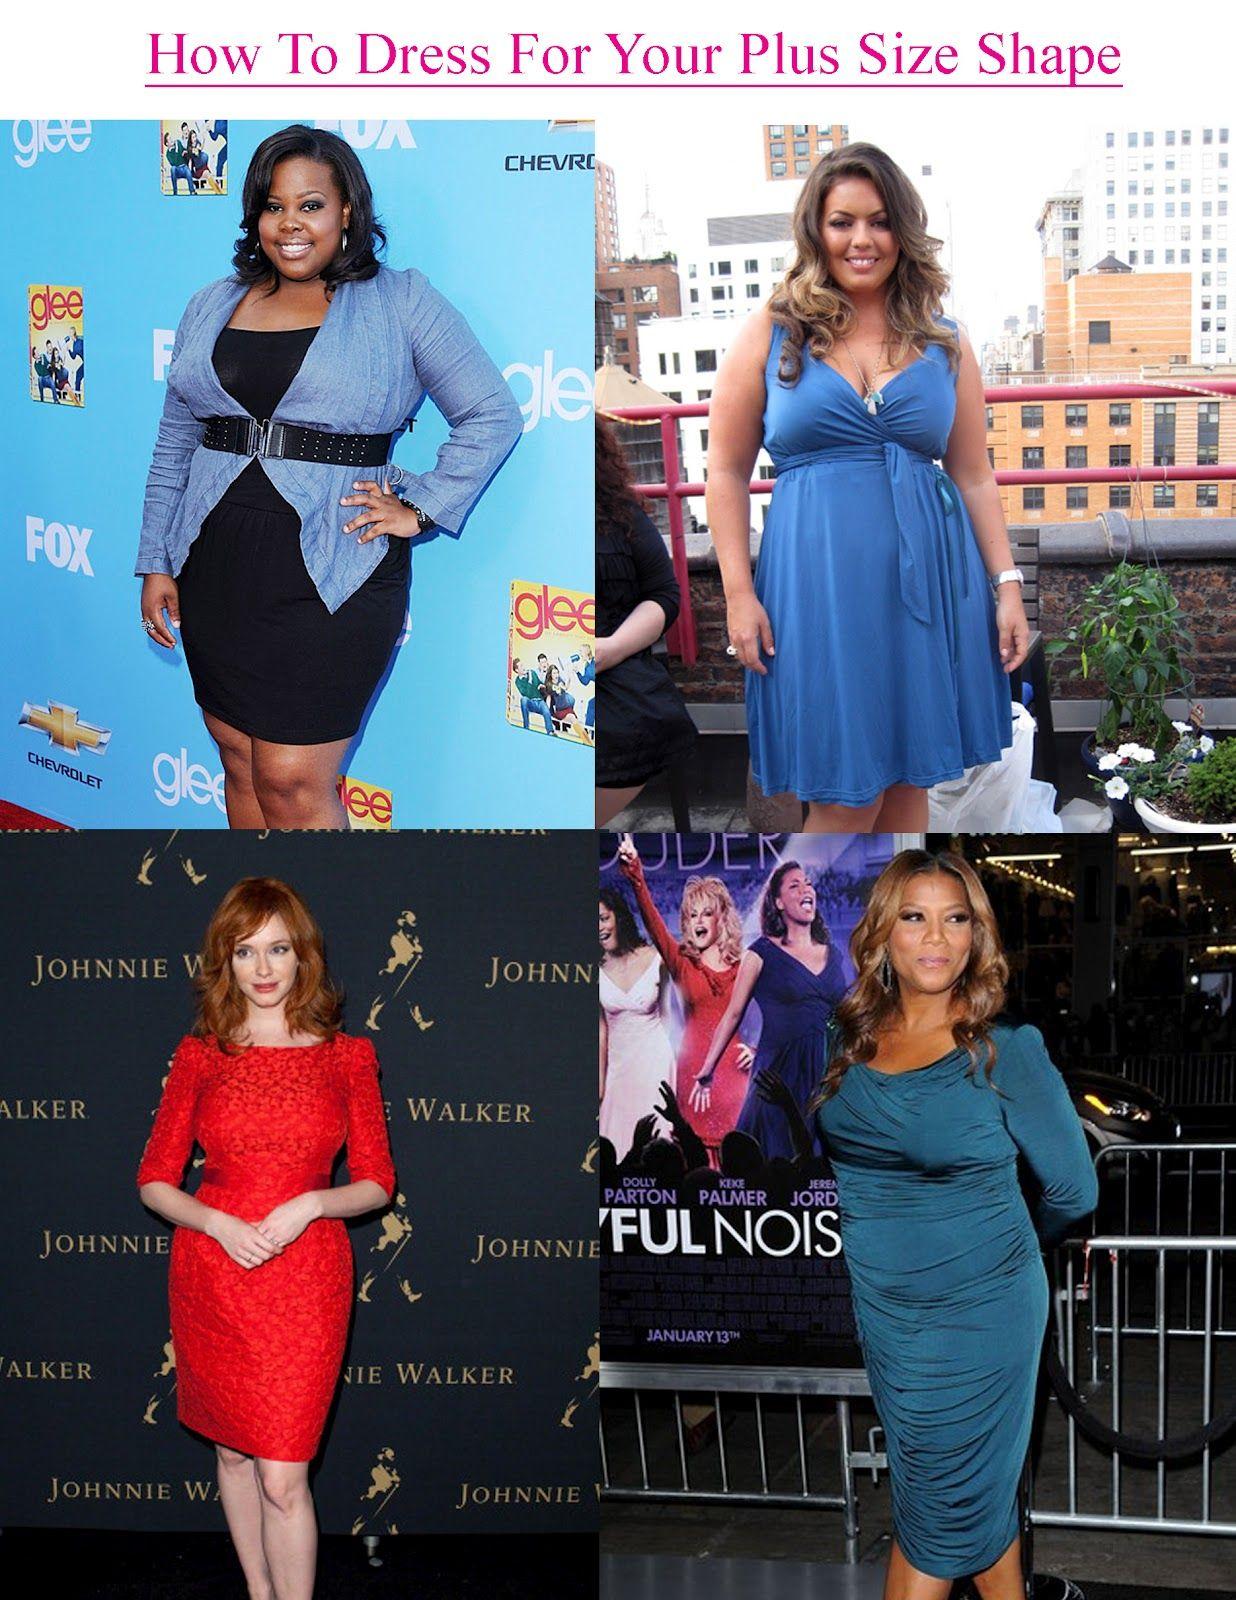 Plus size pear shape dresses for girls